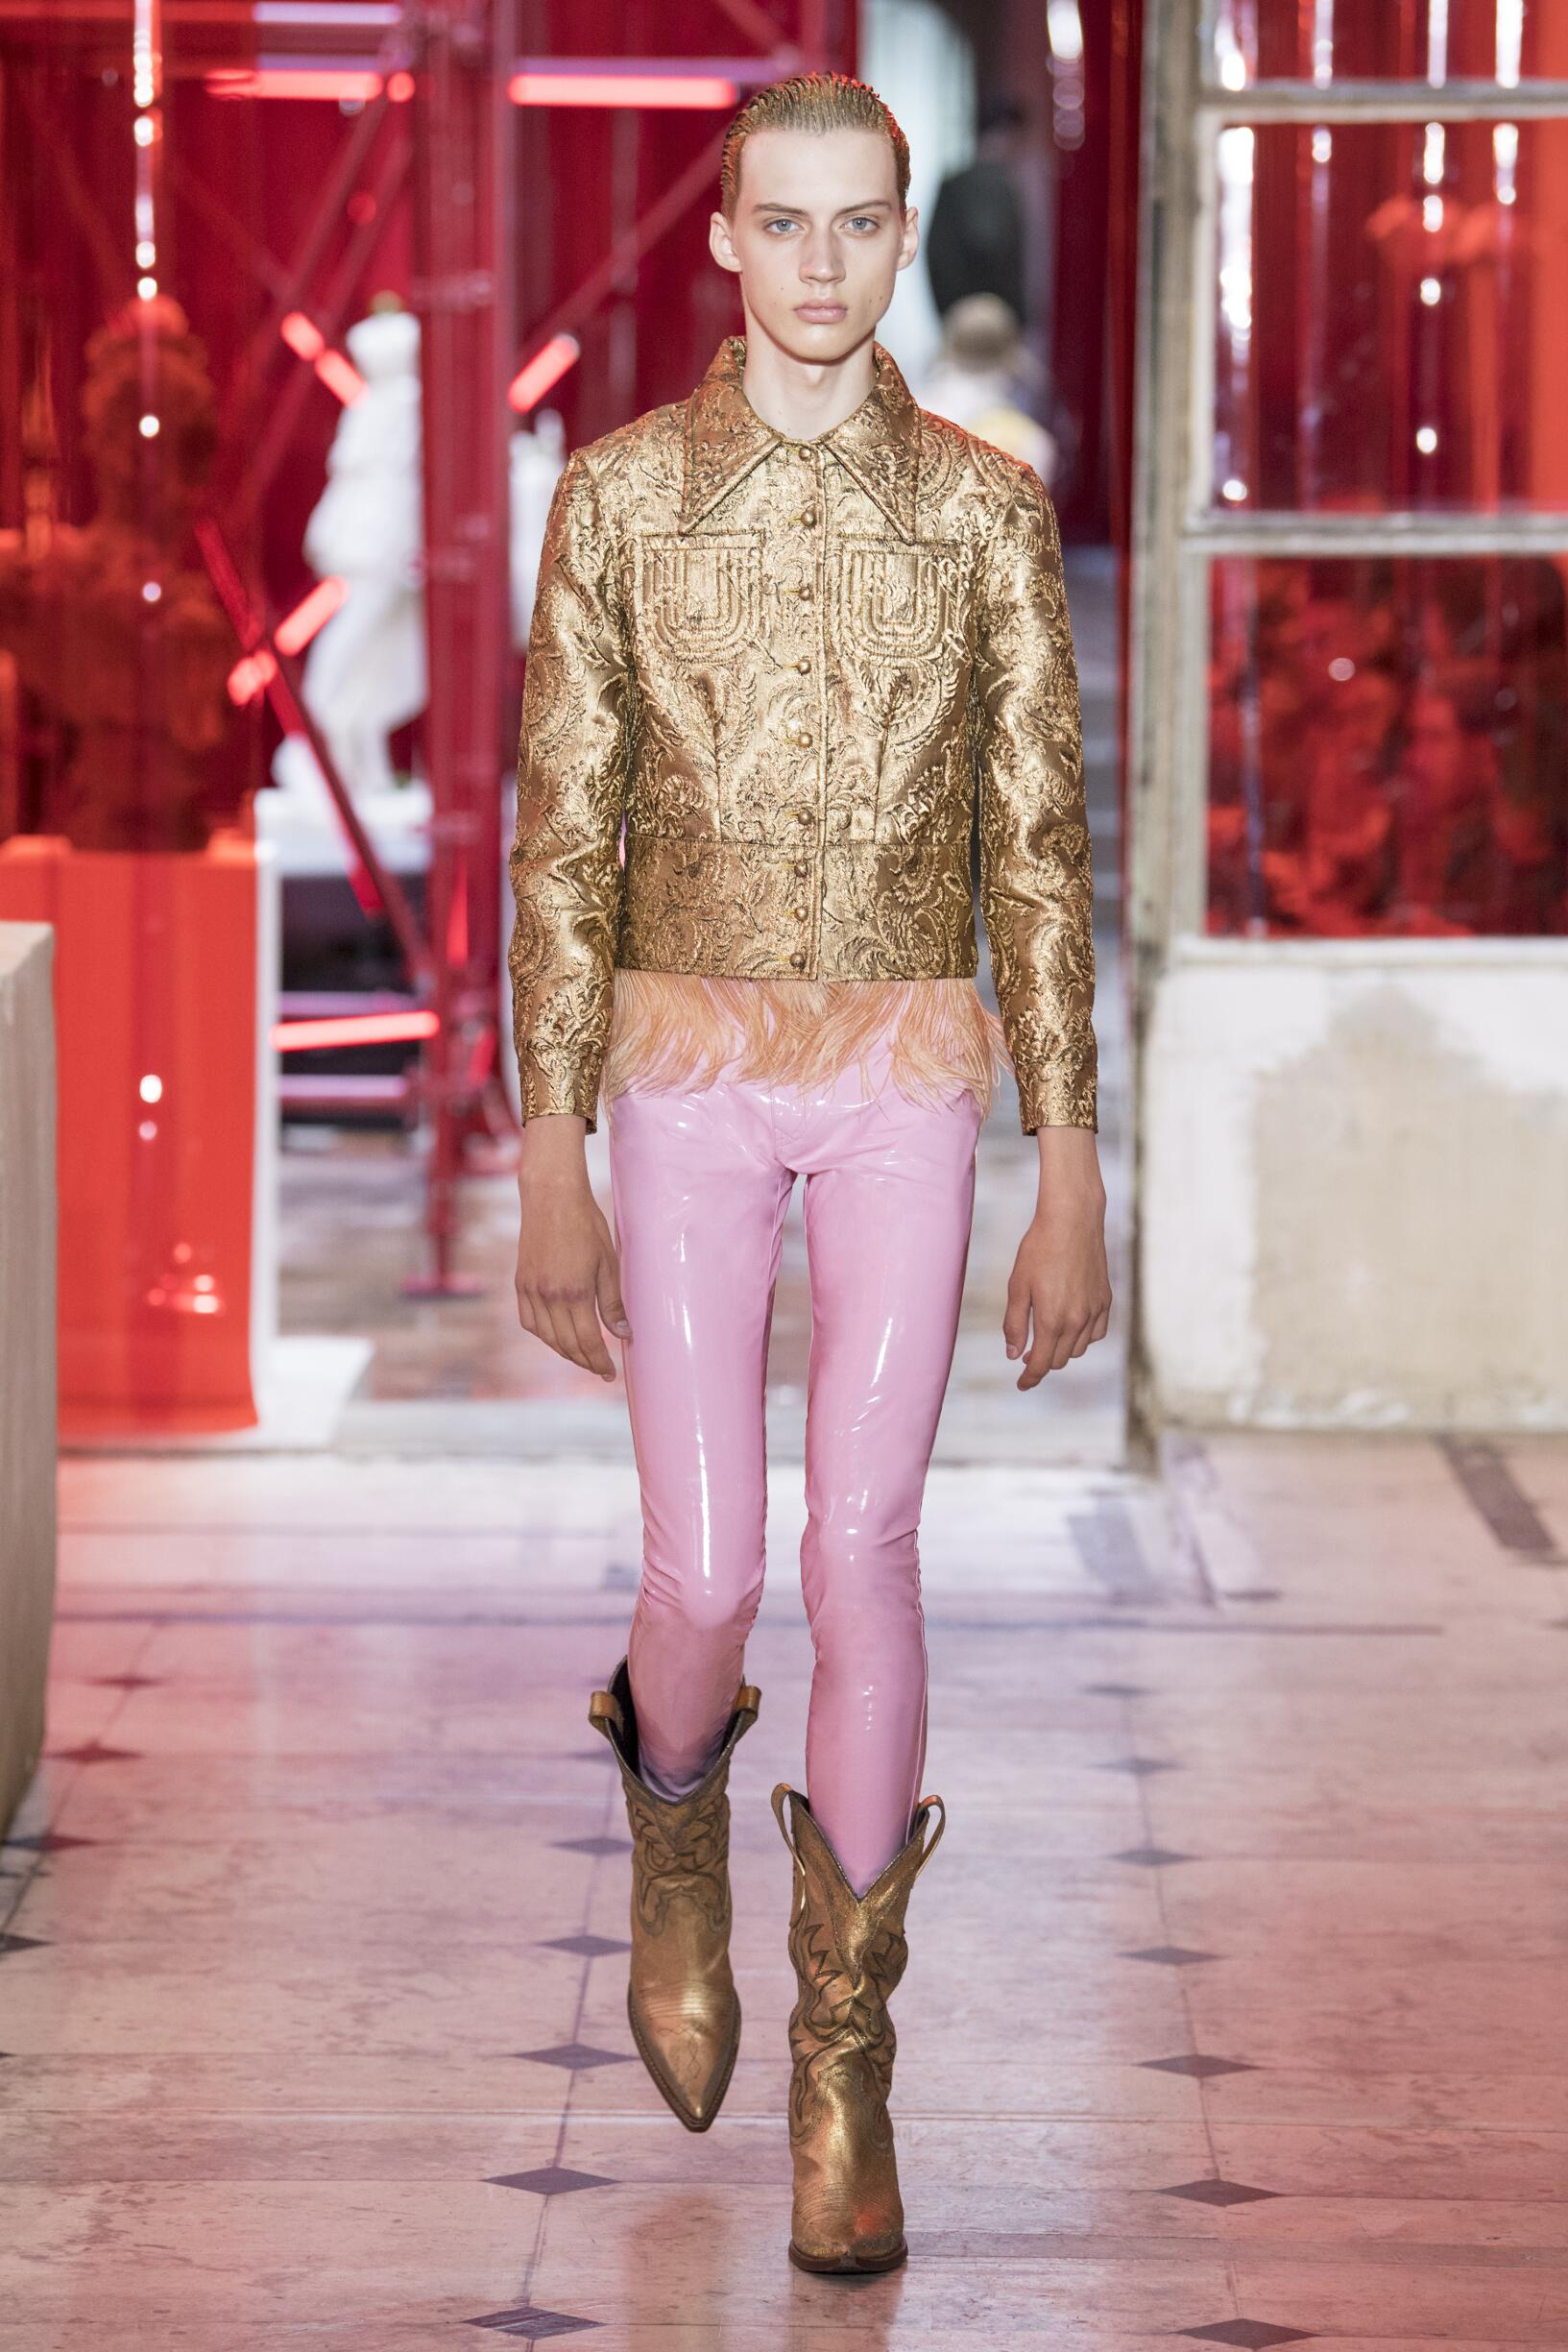 SS 2019 Fashion Show Maison Margiela